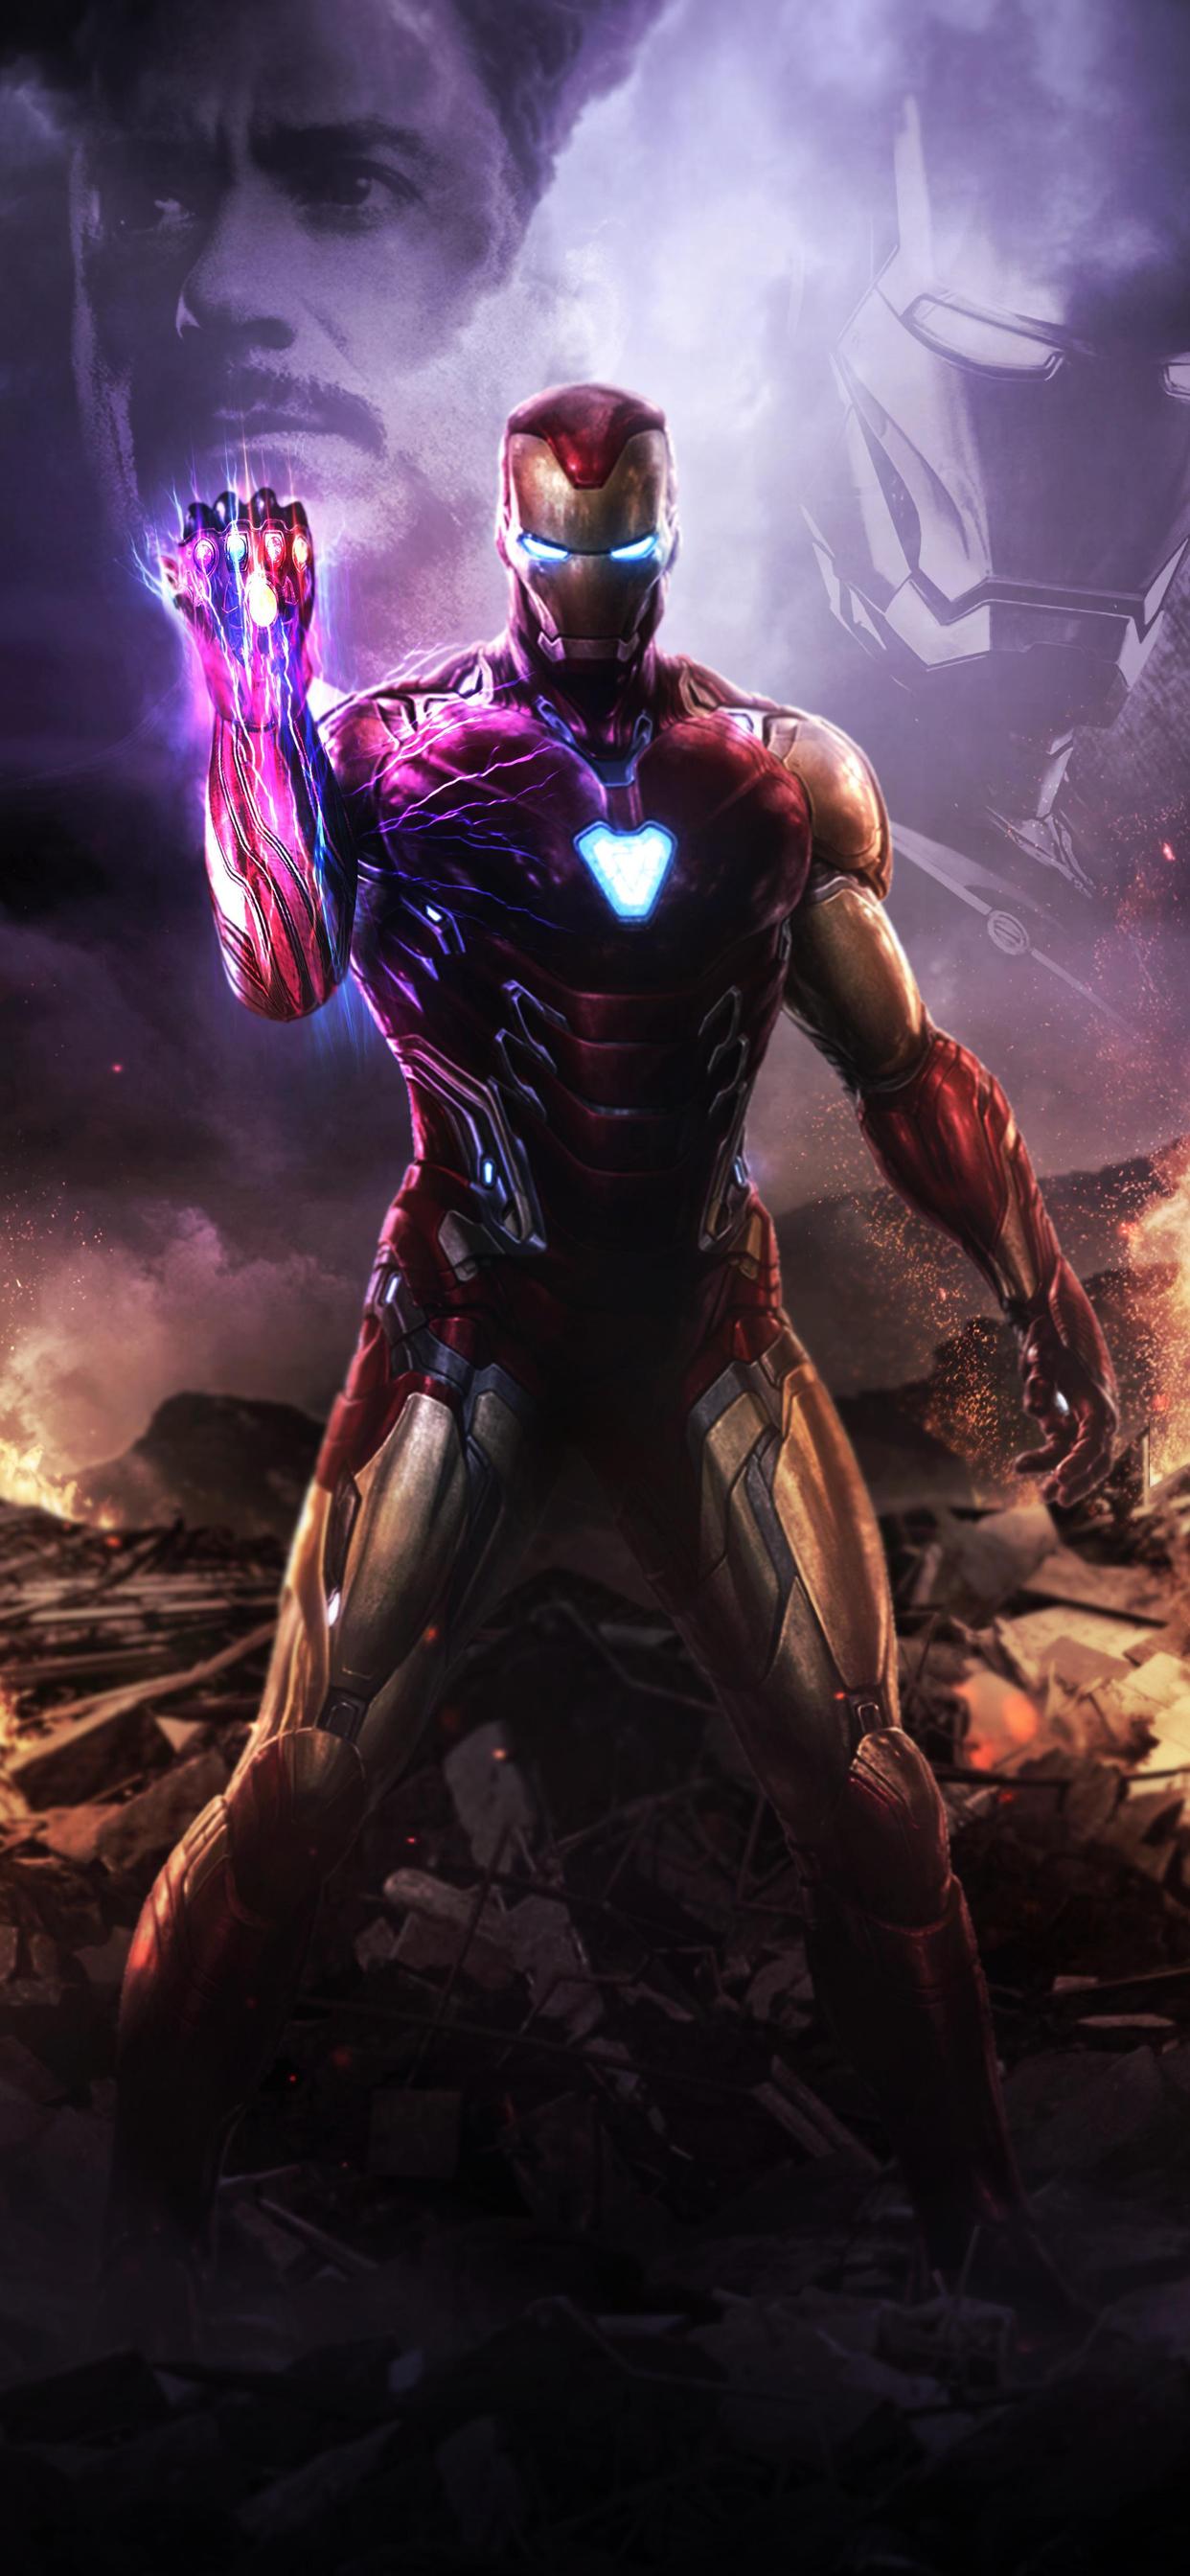 iron-man-infinity-gauntlet-4k-dp.jpg